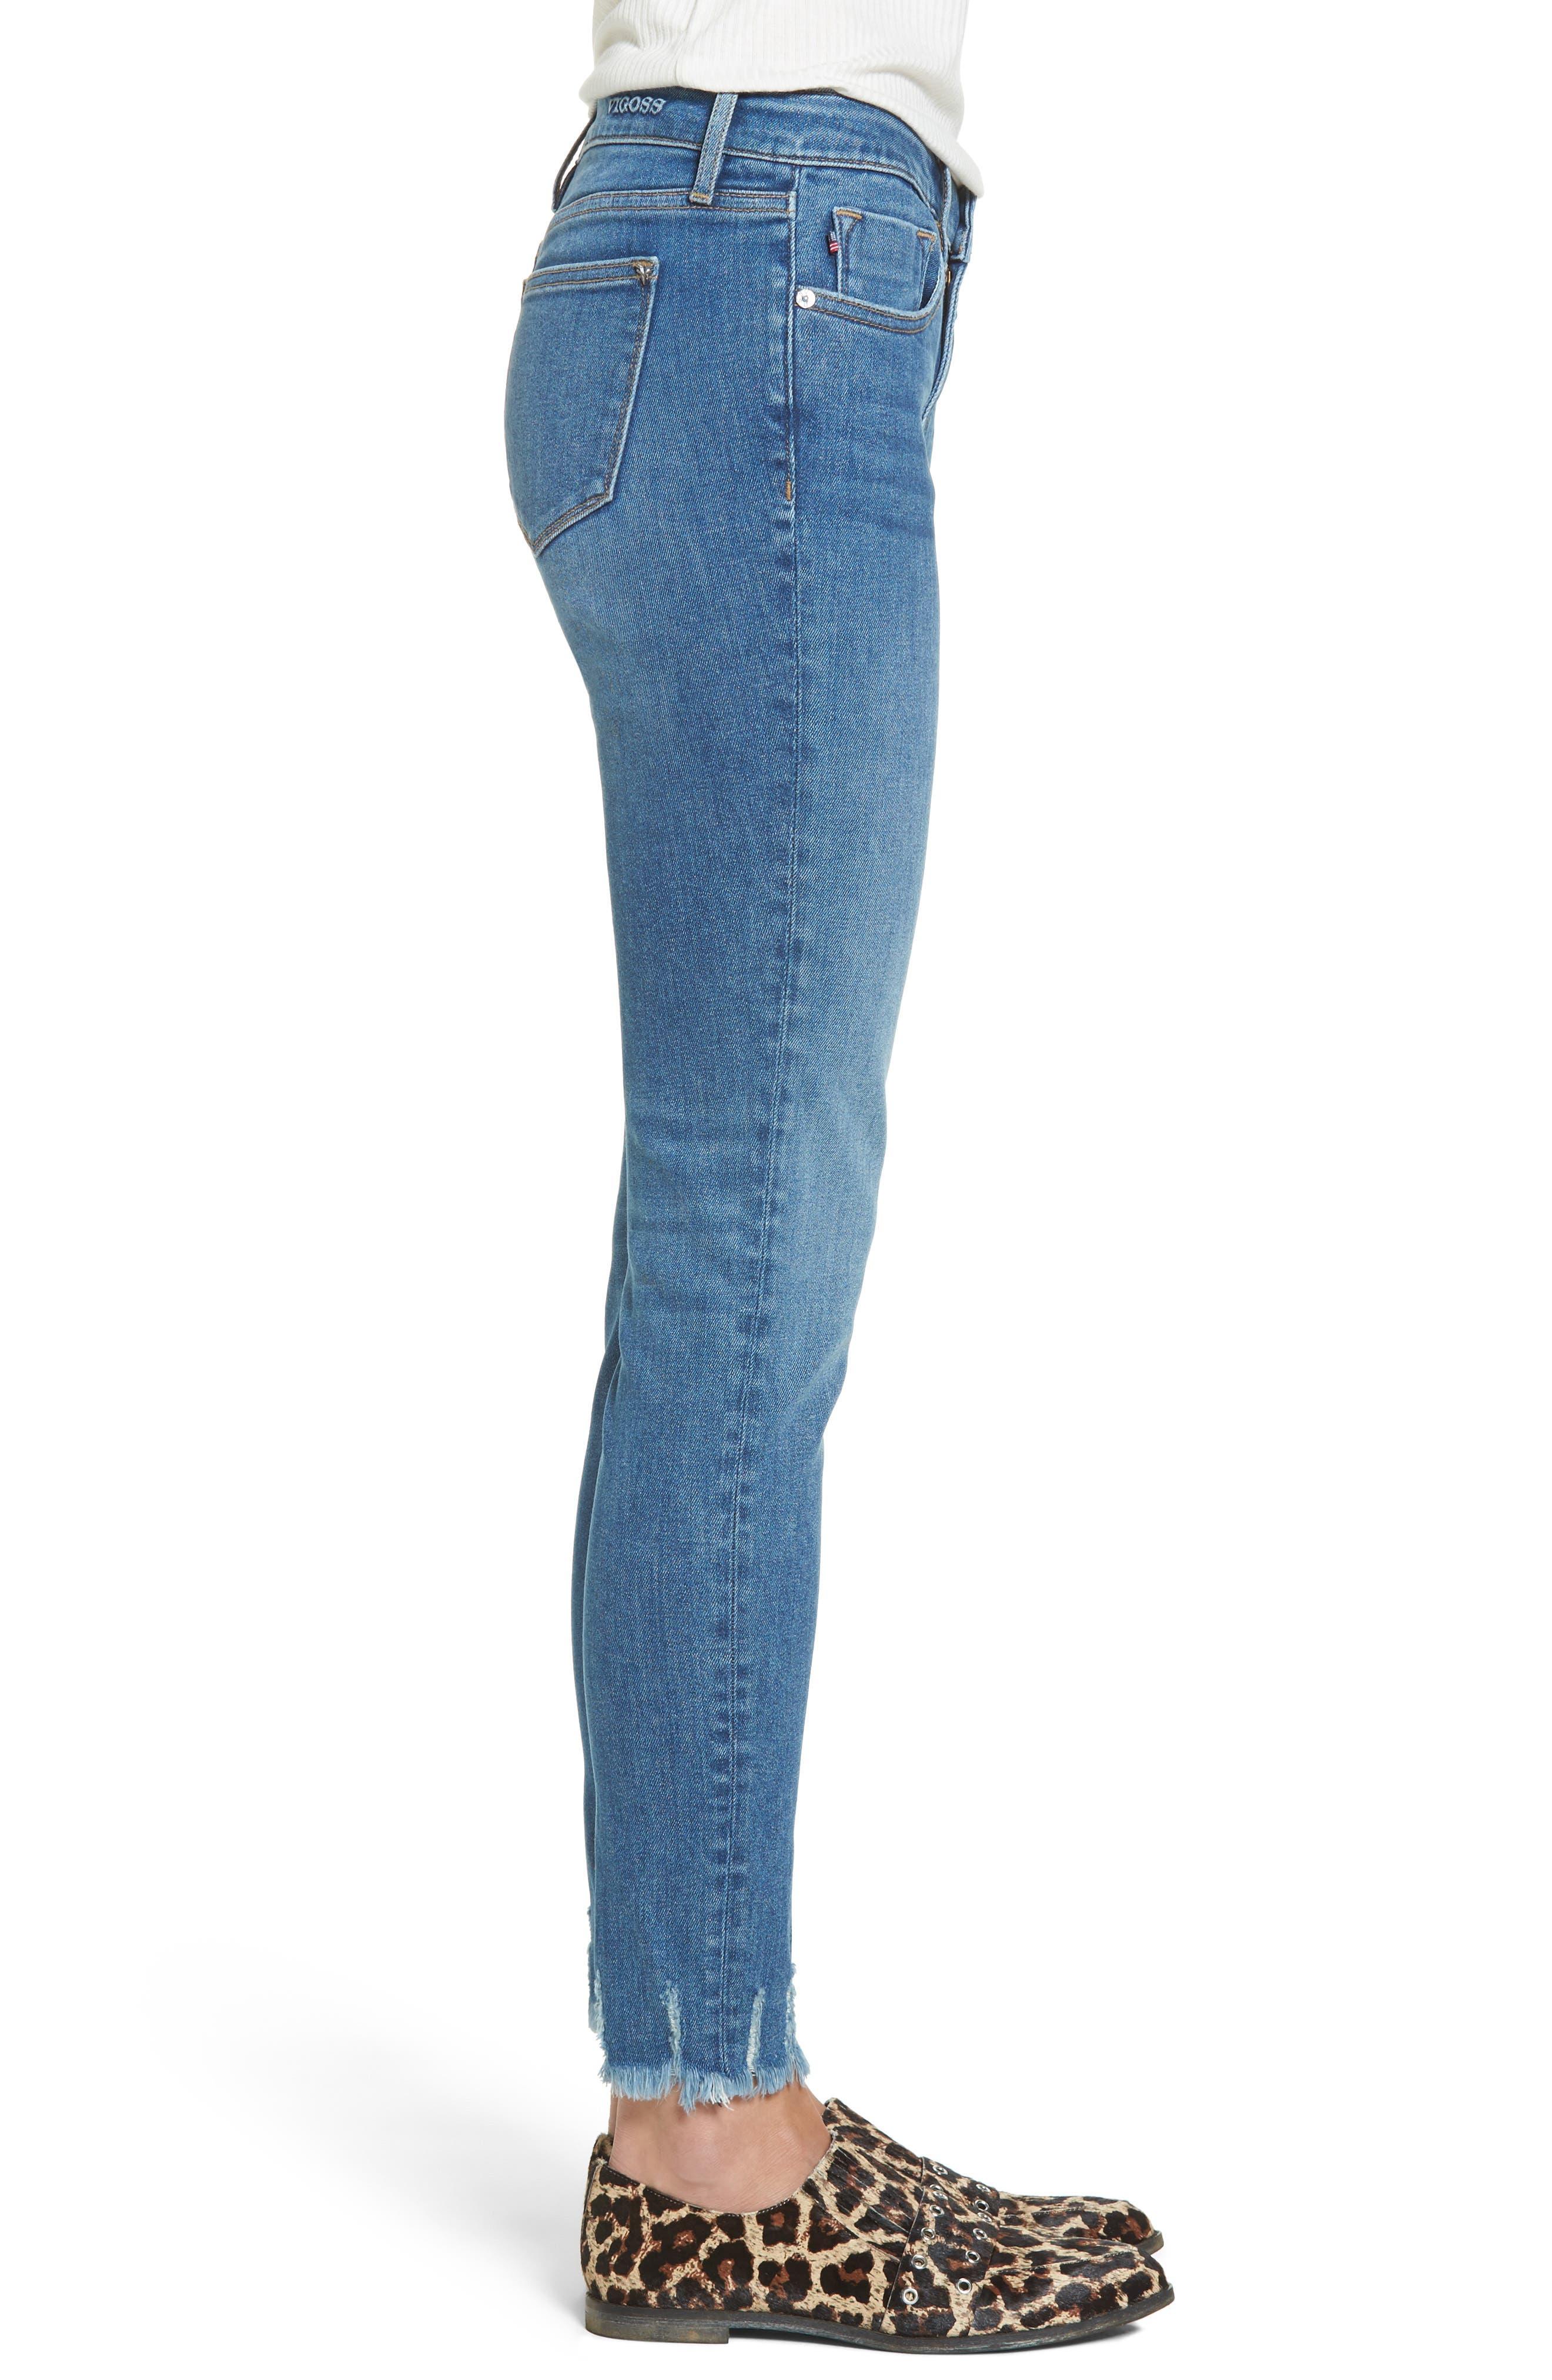 Jagger Skinny Jeans,                             Alternate thumbnail 3, color,                             426